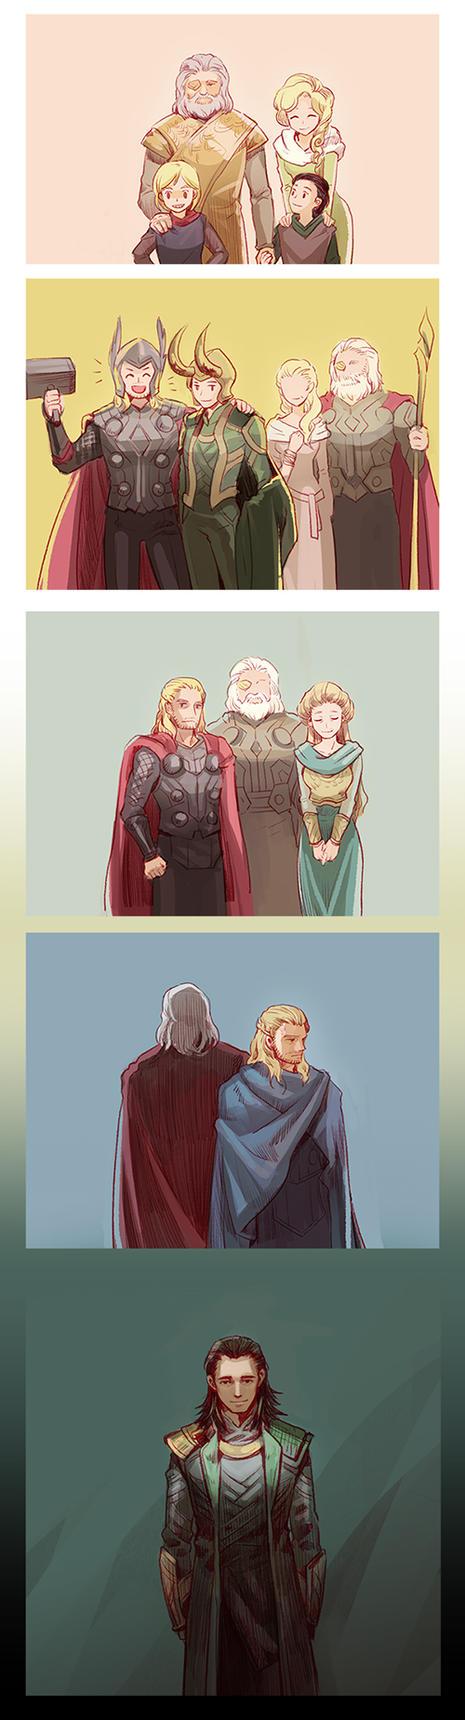 Odin' s family (*Thor2 spoiler alert) by Mushstone